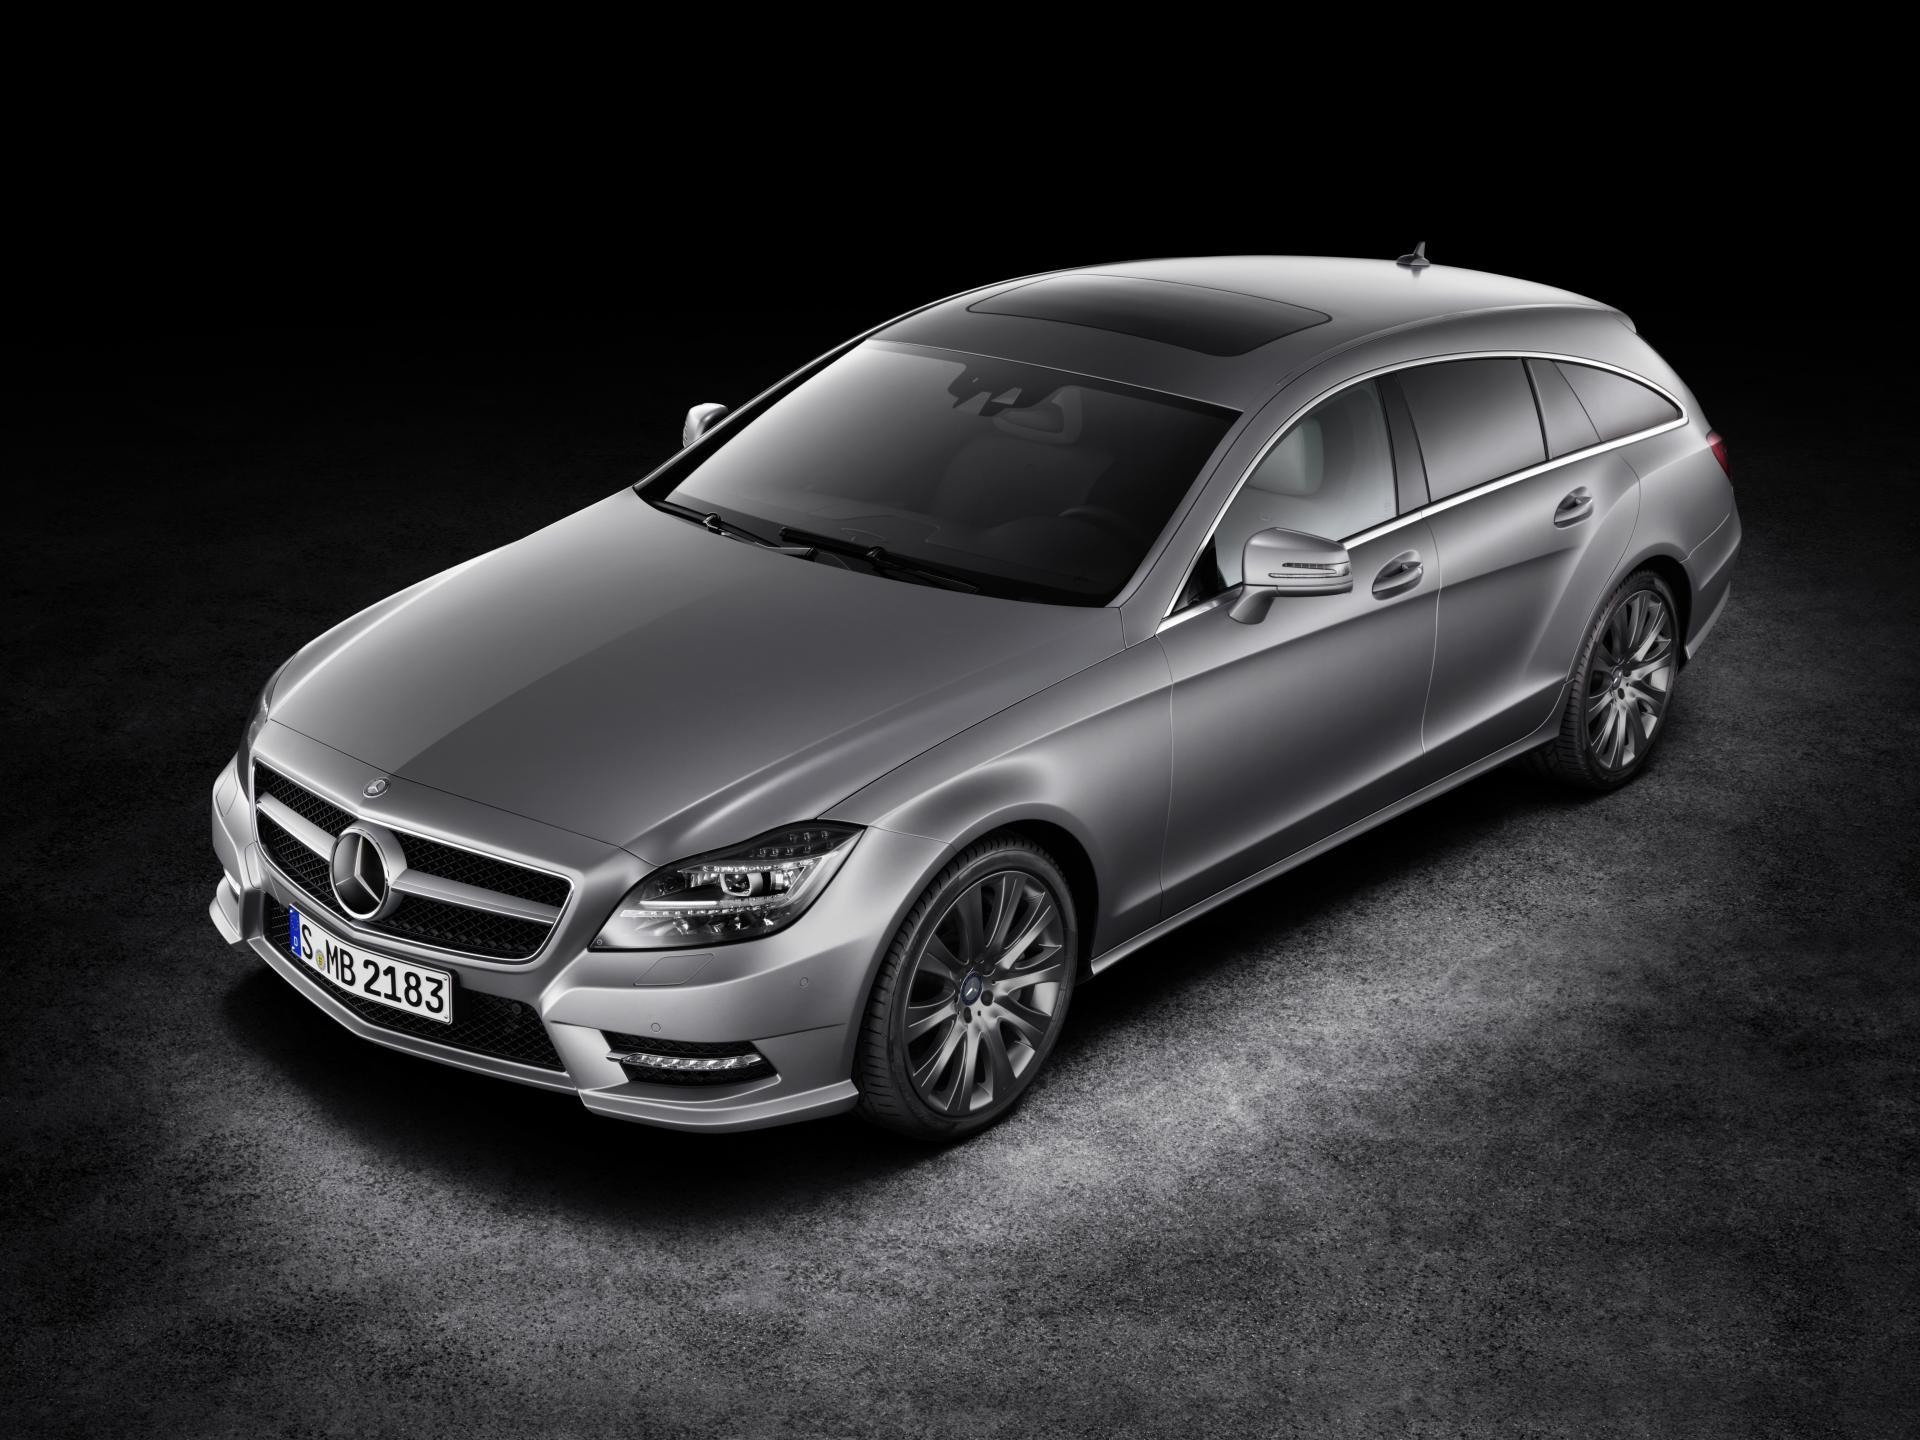 2013 MercedesBenz CLS Shooting Brake  conceptcarzcom